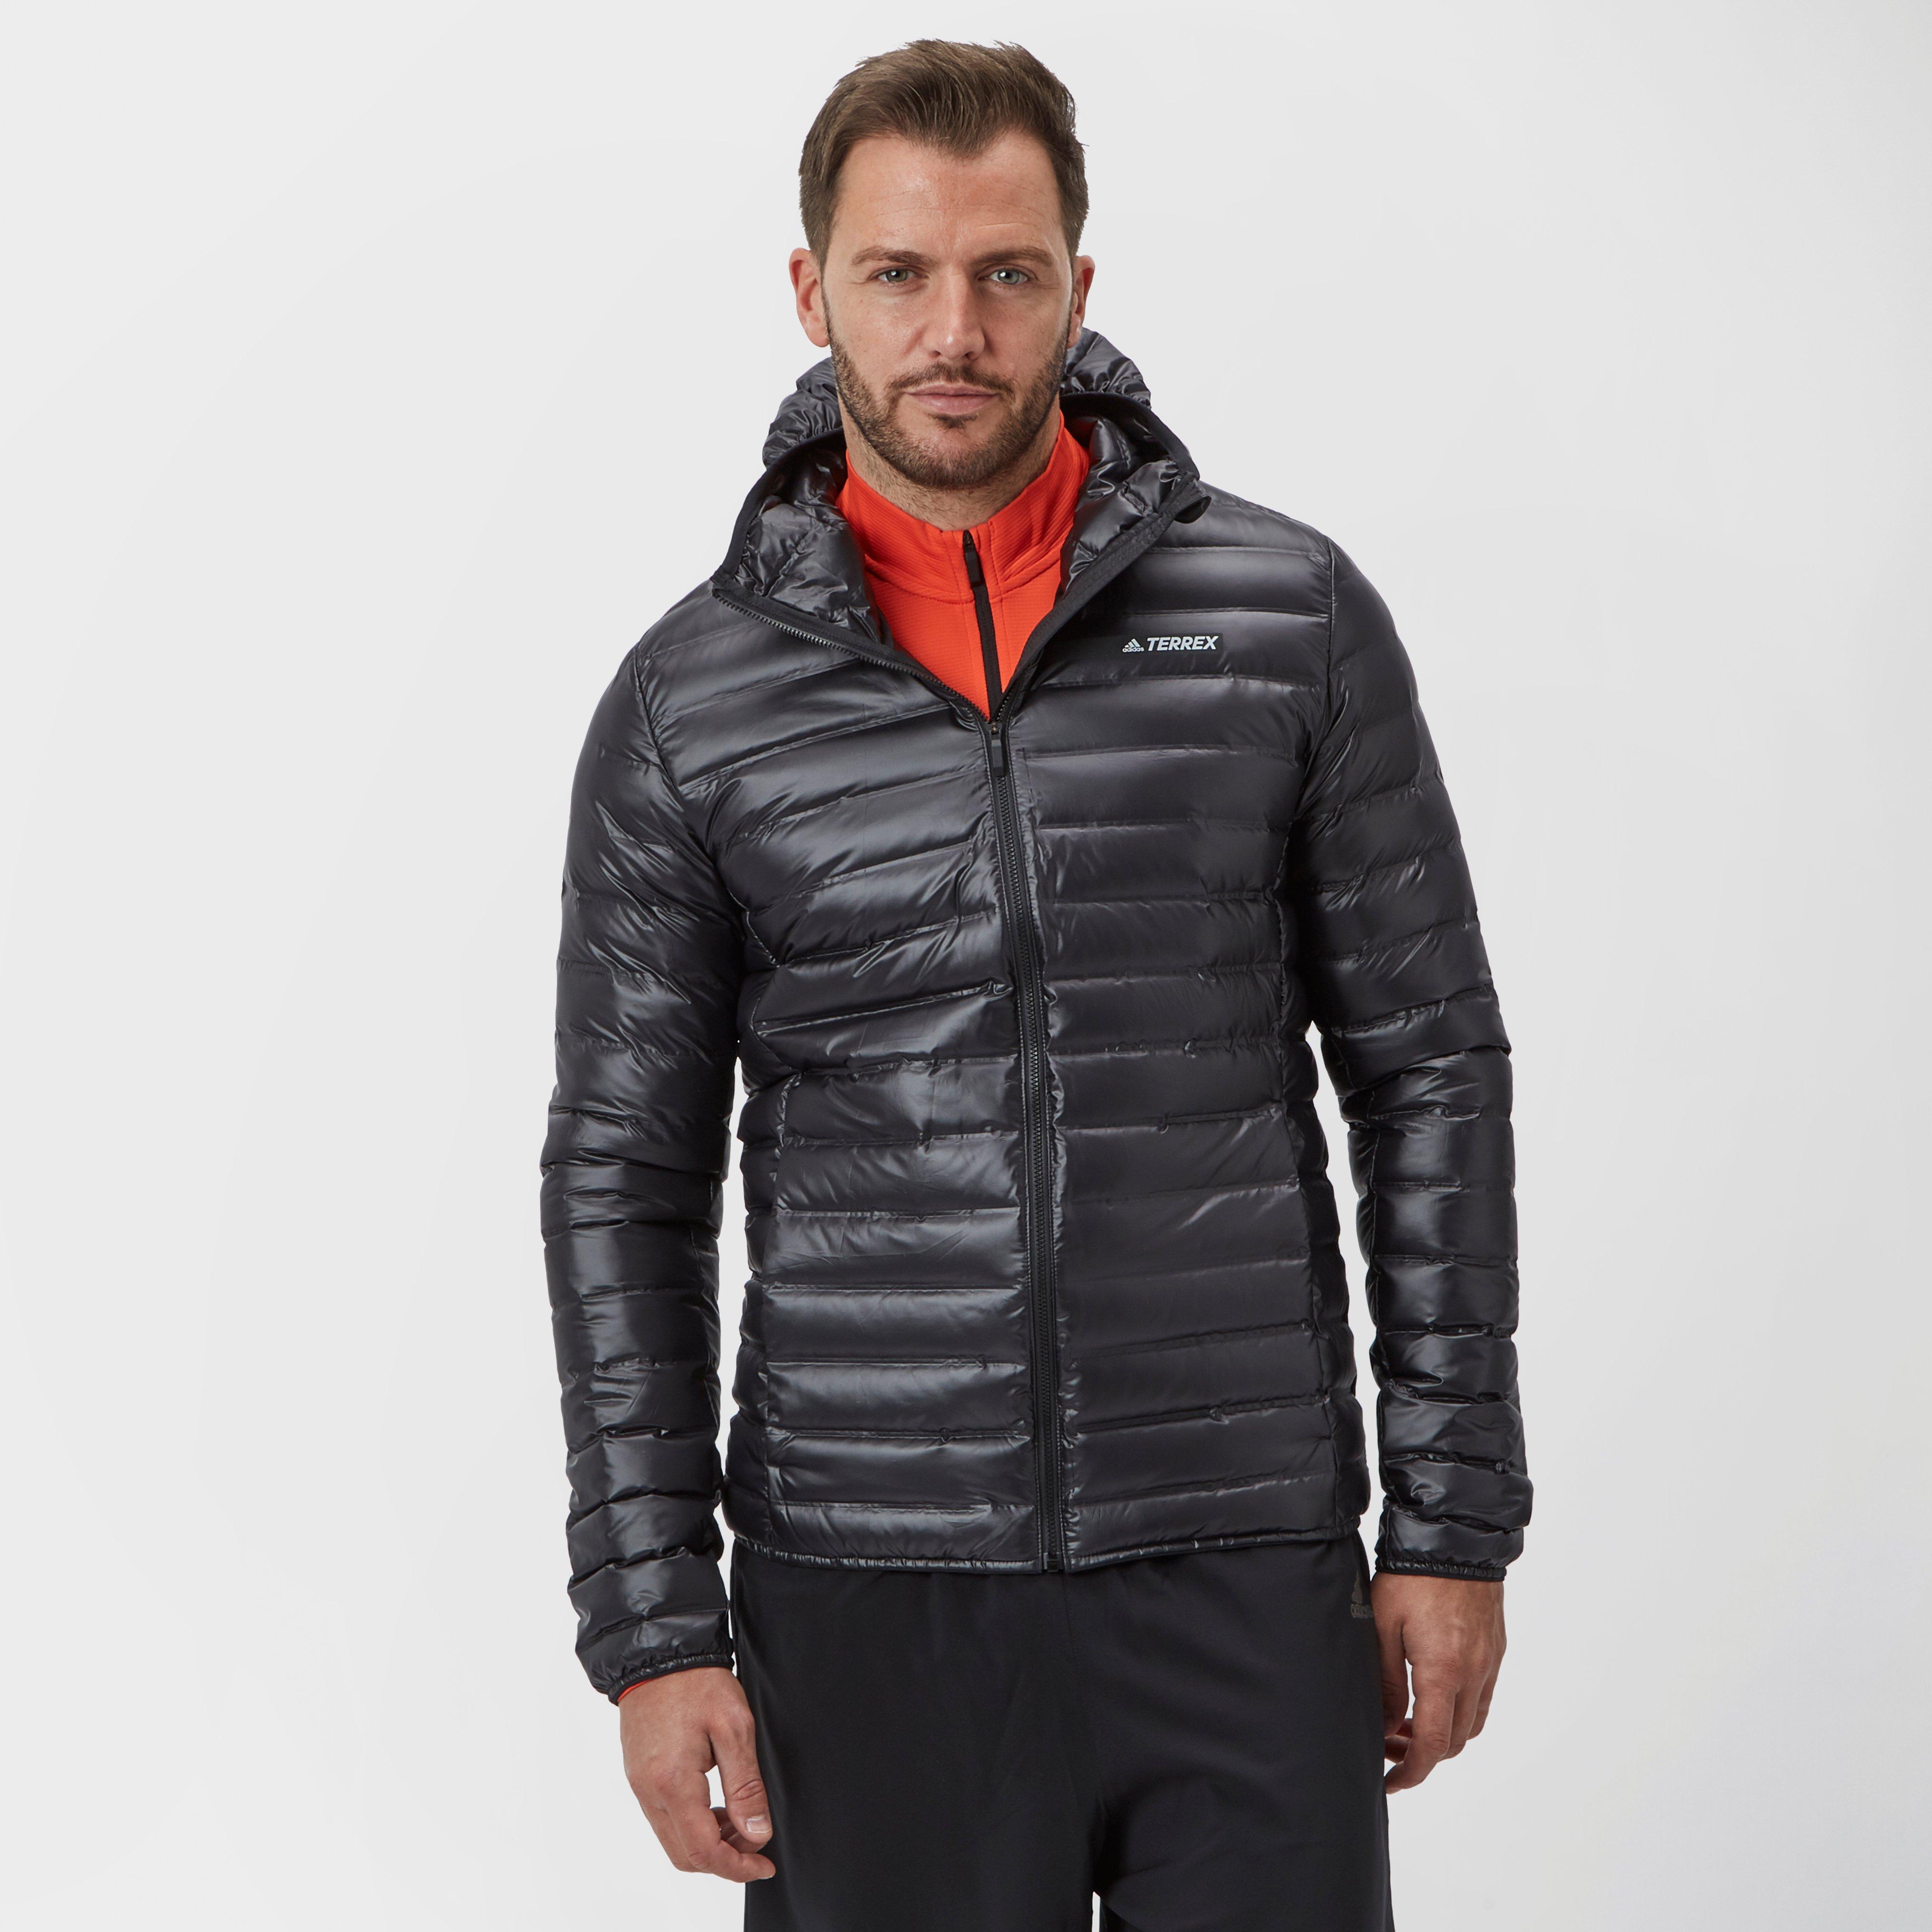 Men's light jacket